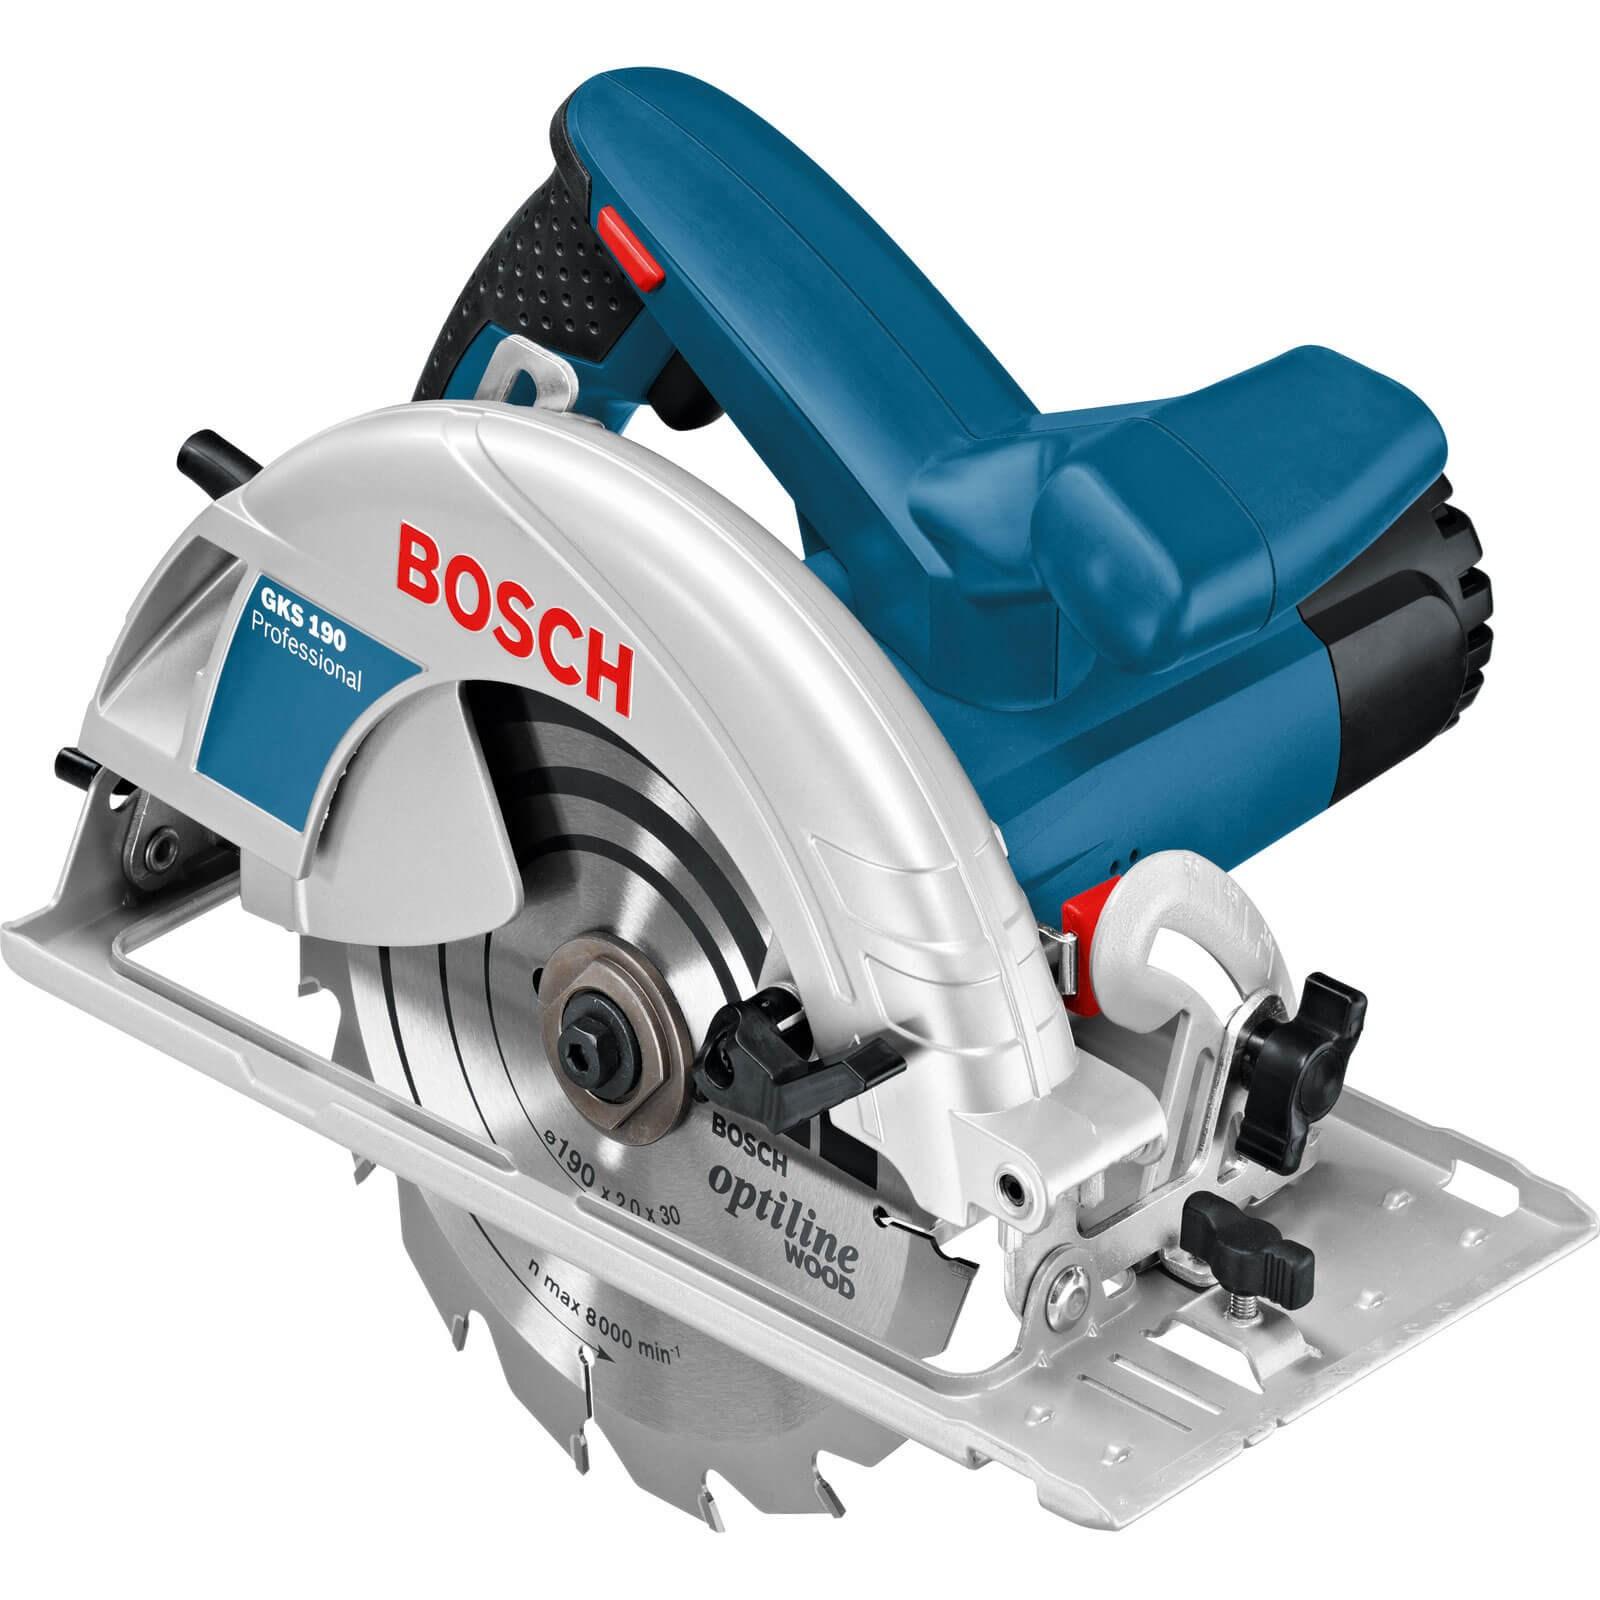 Bosch Gks 190 Circular Saw 190mm Circular Saws